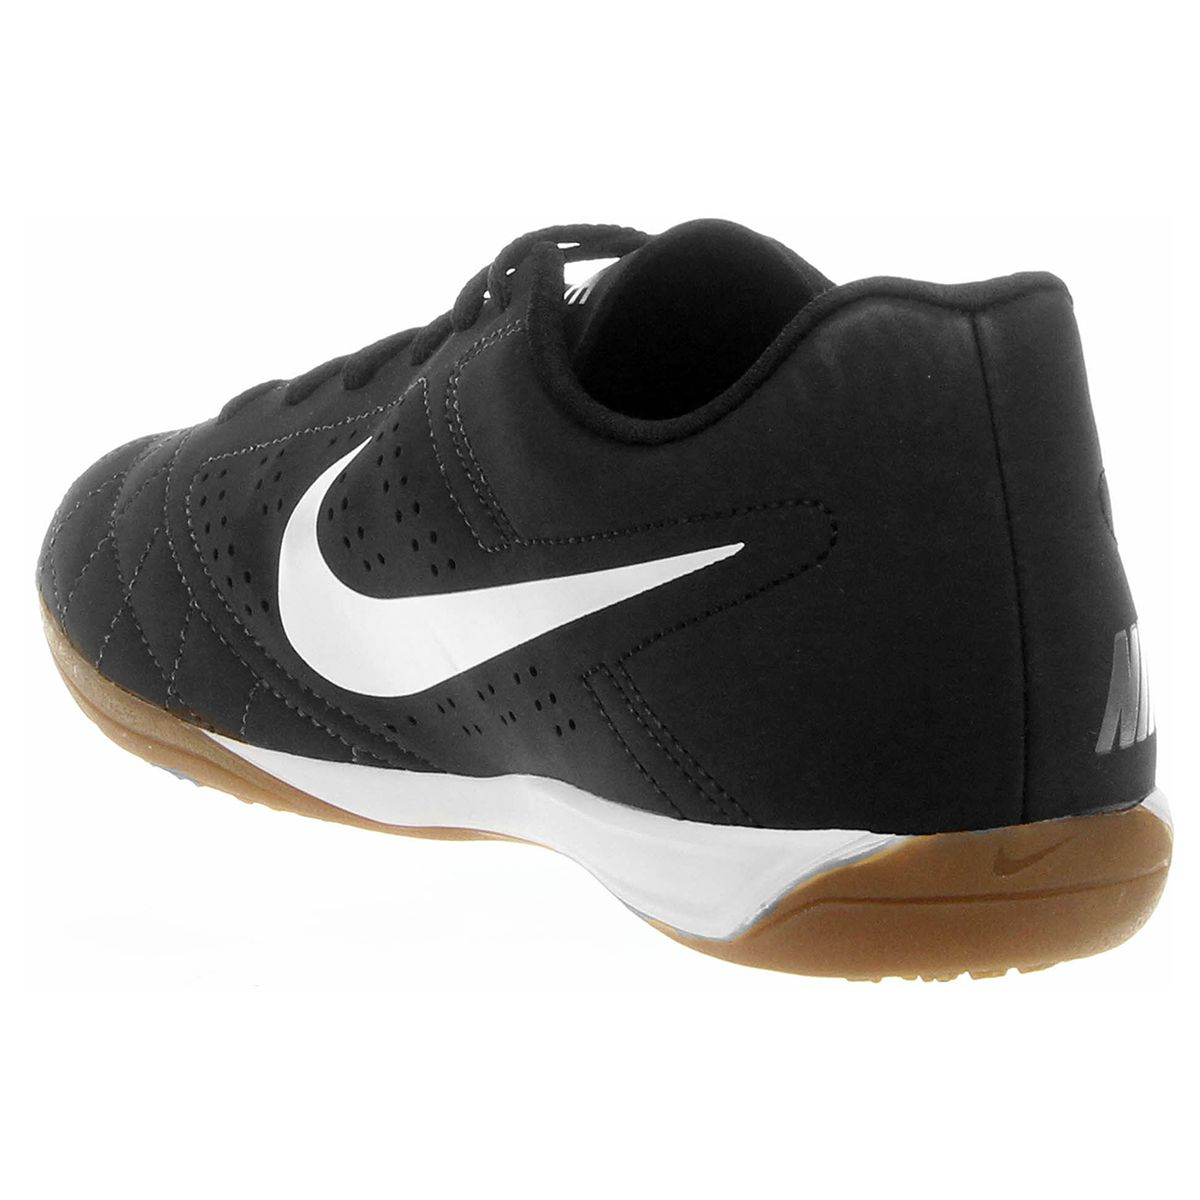 ffb95382c5d9b Tenis Futsal Nike Beco 2 Adulto - SPORT CENTER JARAGUÁ